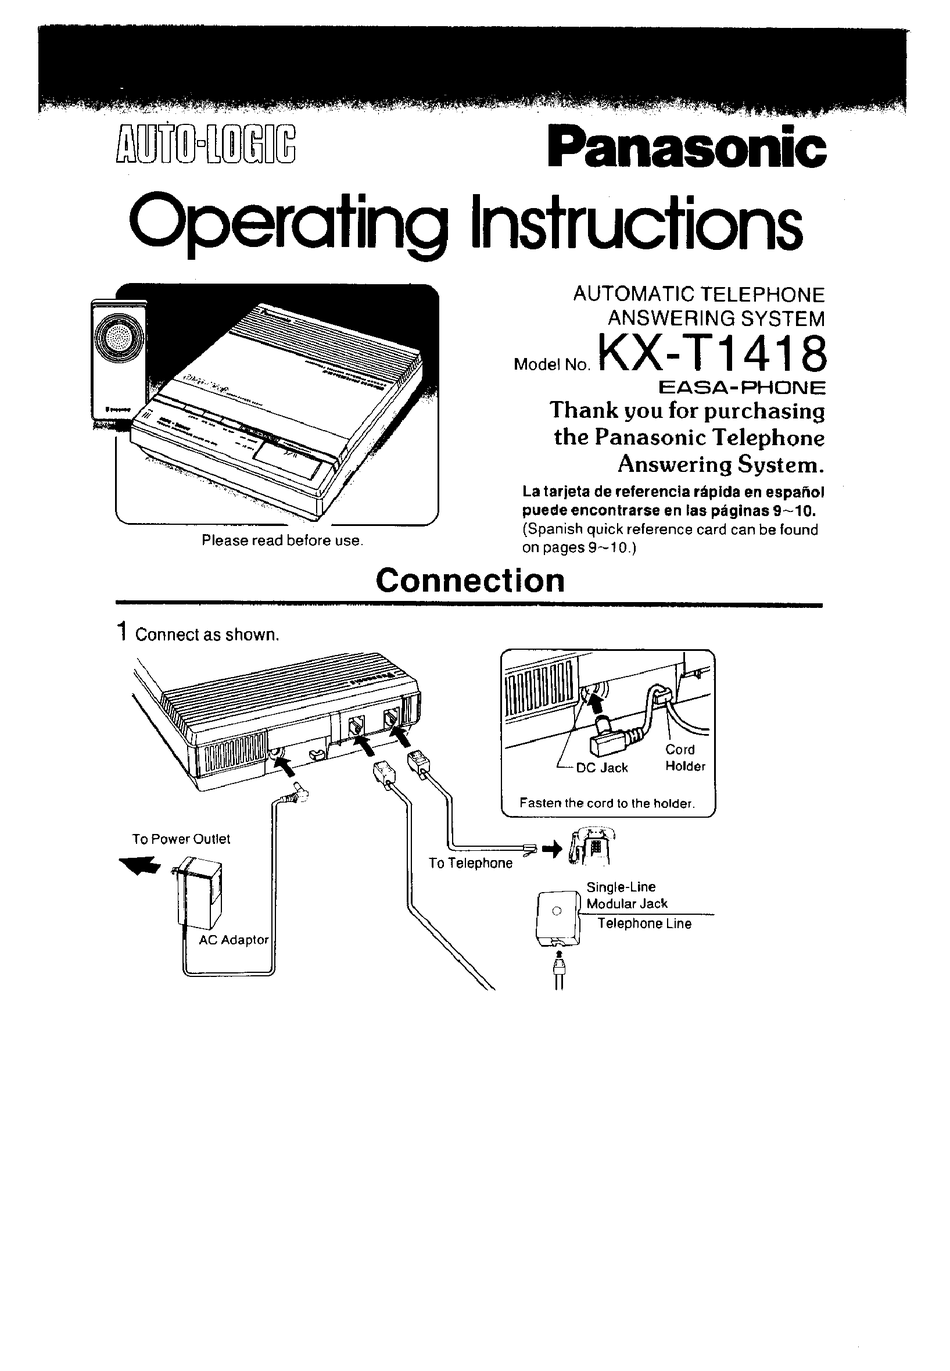 PANASONIC KX-T1418 OPERATING INSTRUCTIONS MANUAL Pdf